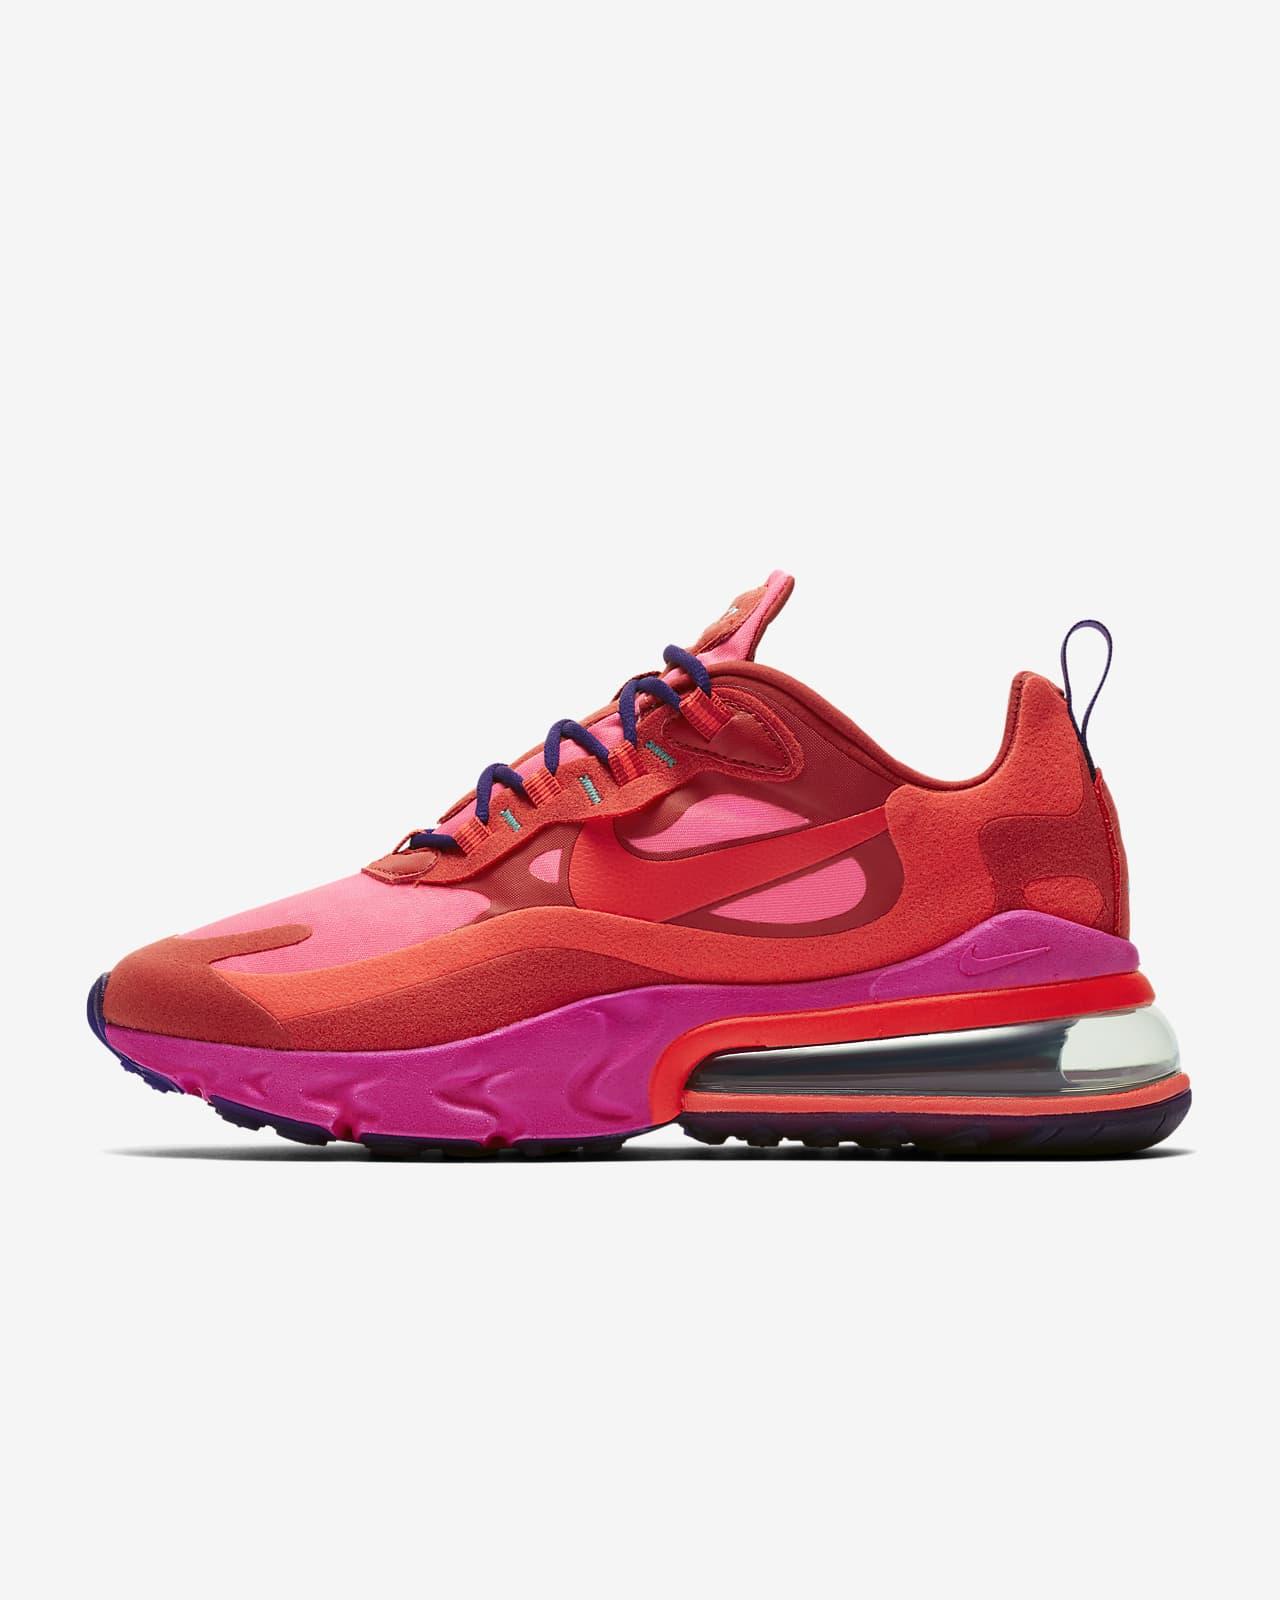 Chaussures Nike Air Max 270 React pour Femme